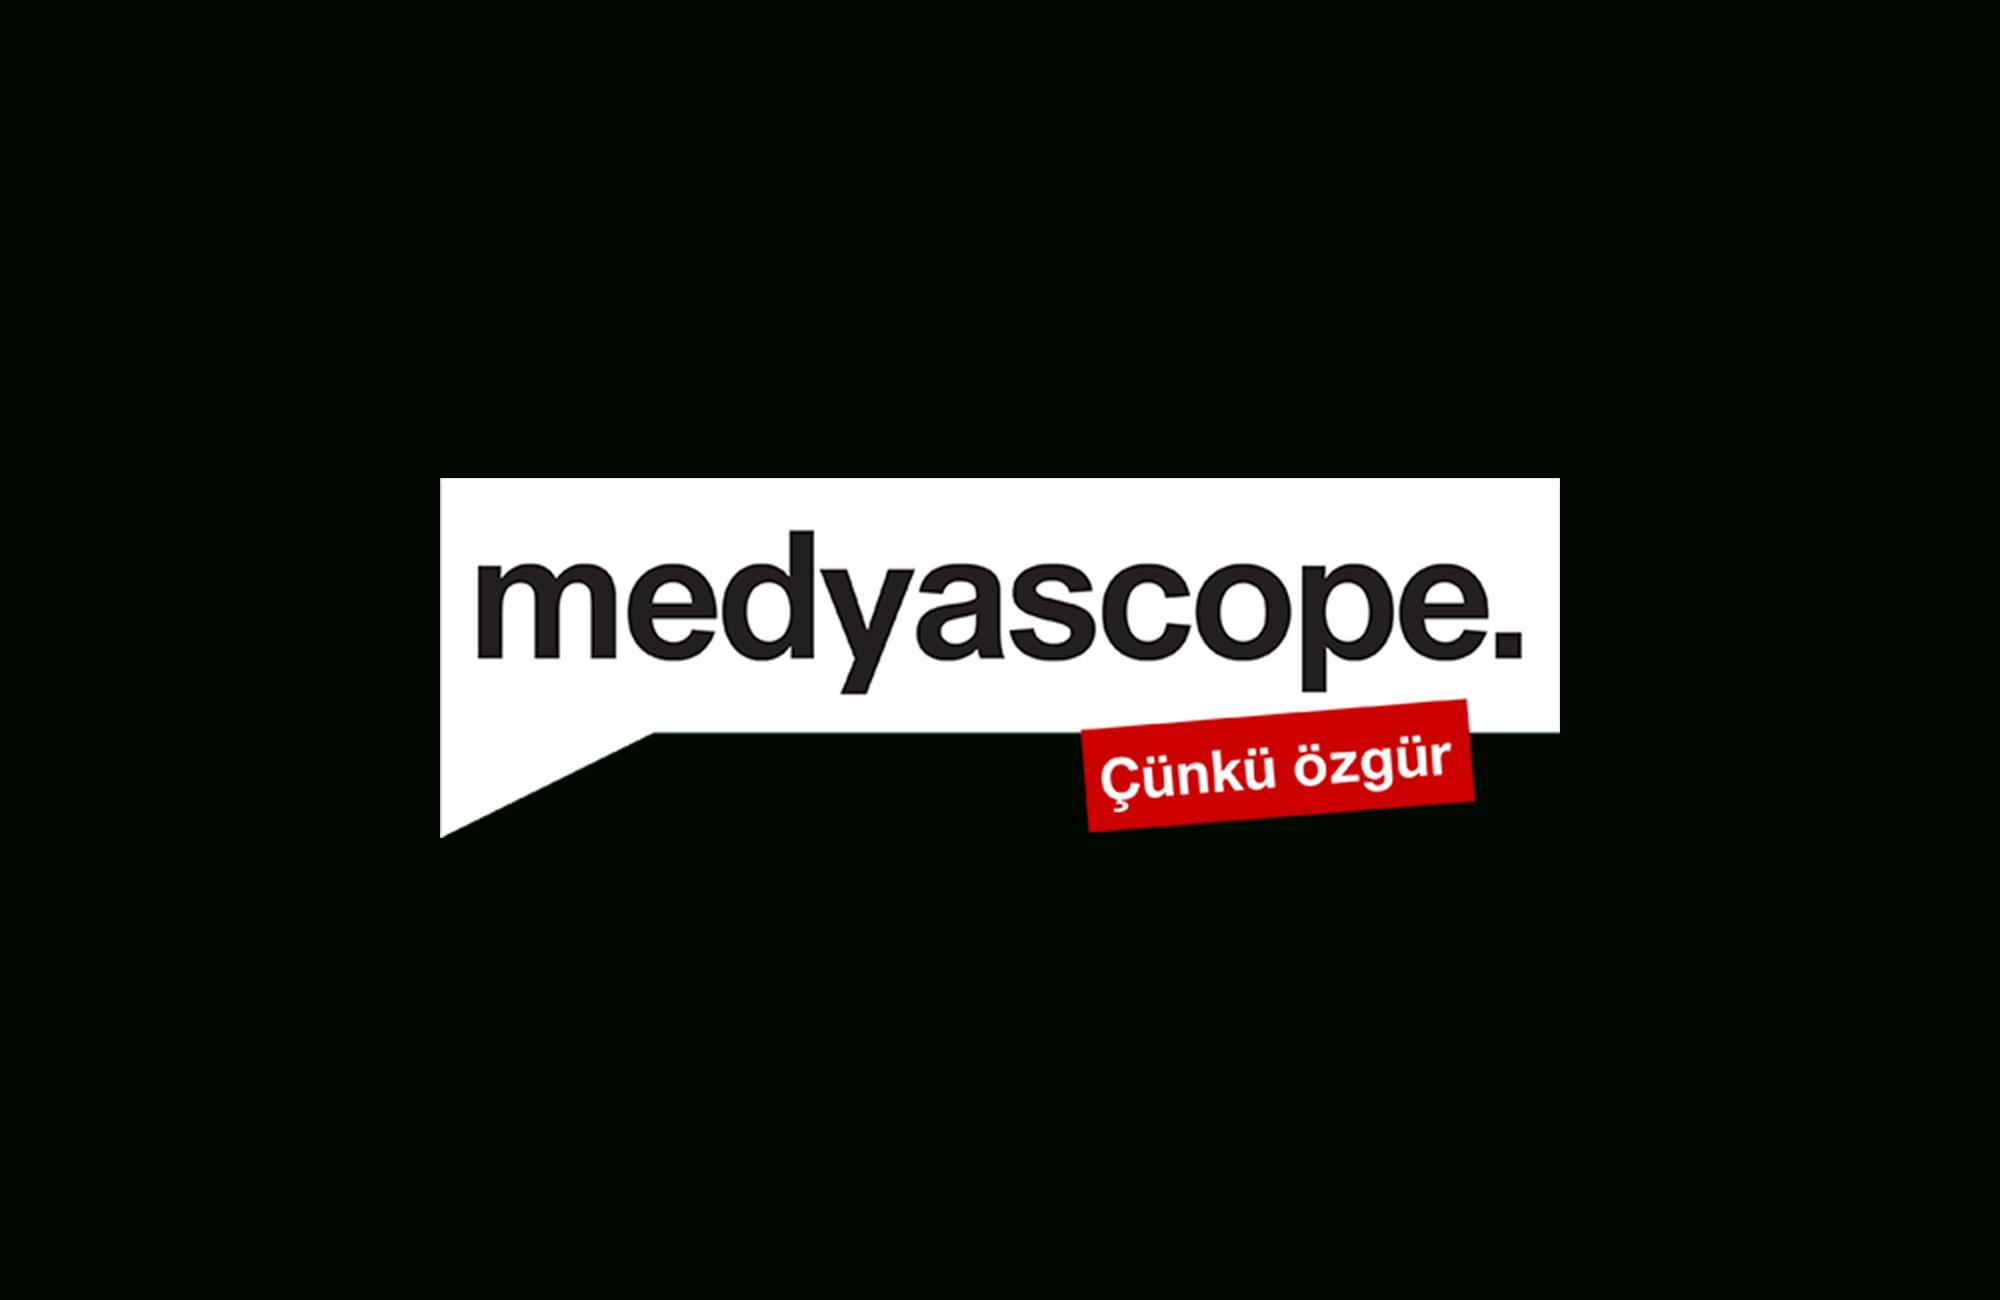 Medyascope Logo - Placeholder